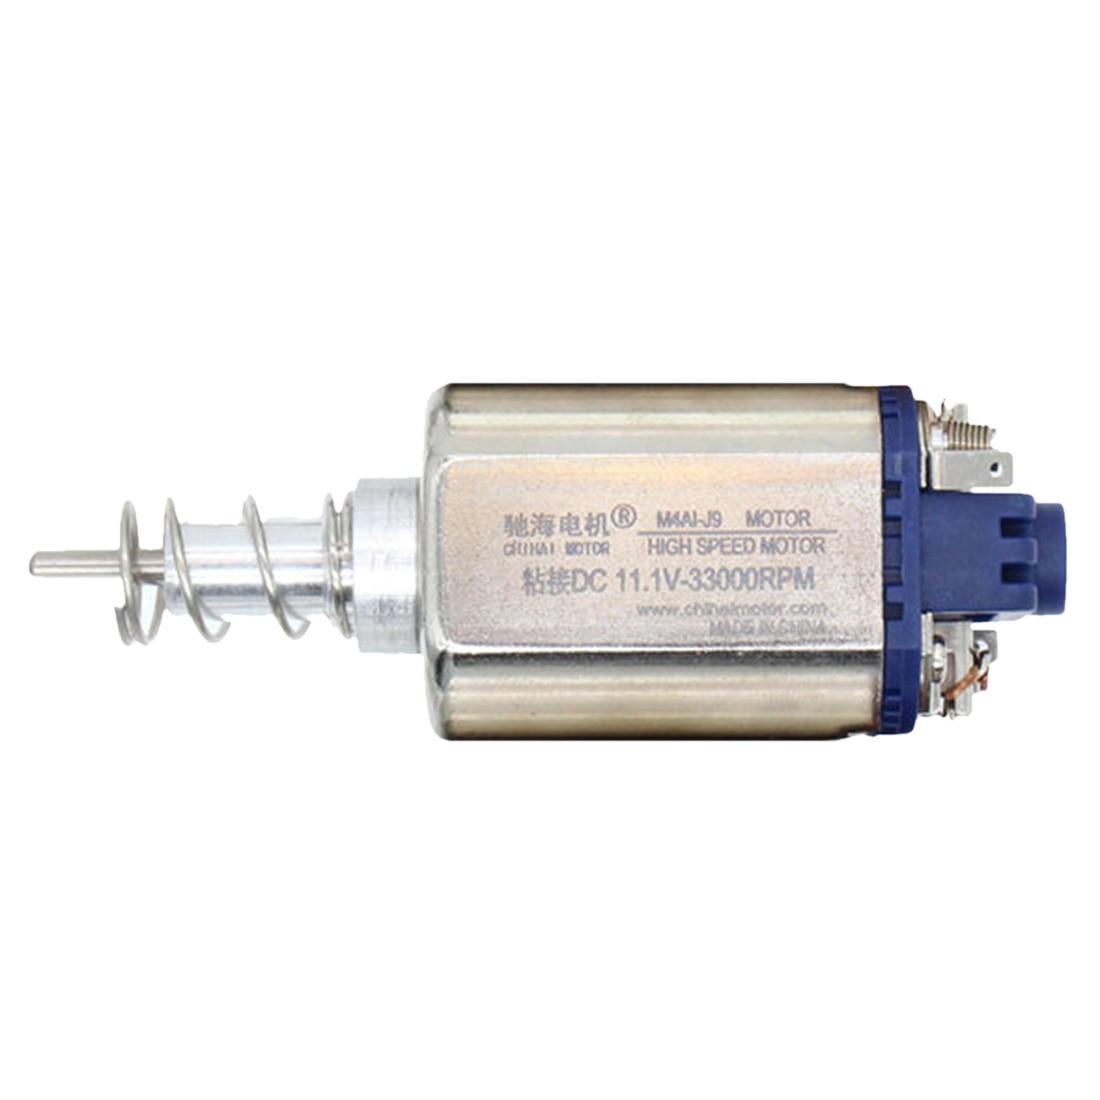 CH 460 Long-axis 11.1V-33000rpm Strong Bonding Magnetic Motor for JM Gen.9 M4A1 Water Gel Beads Blaster Modificaton